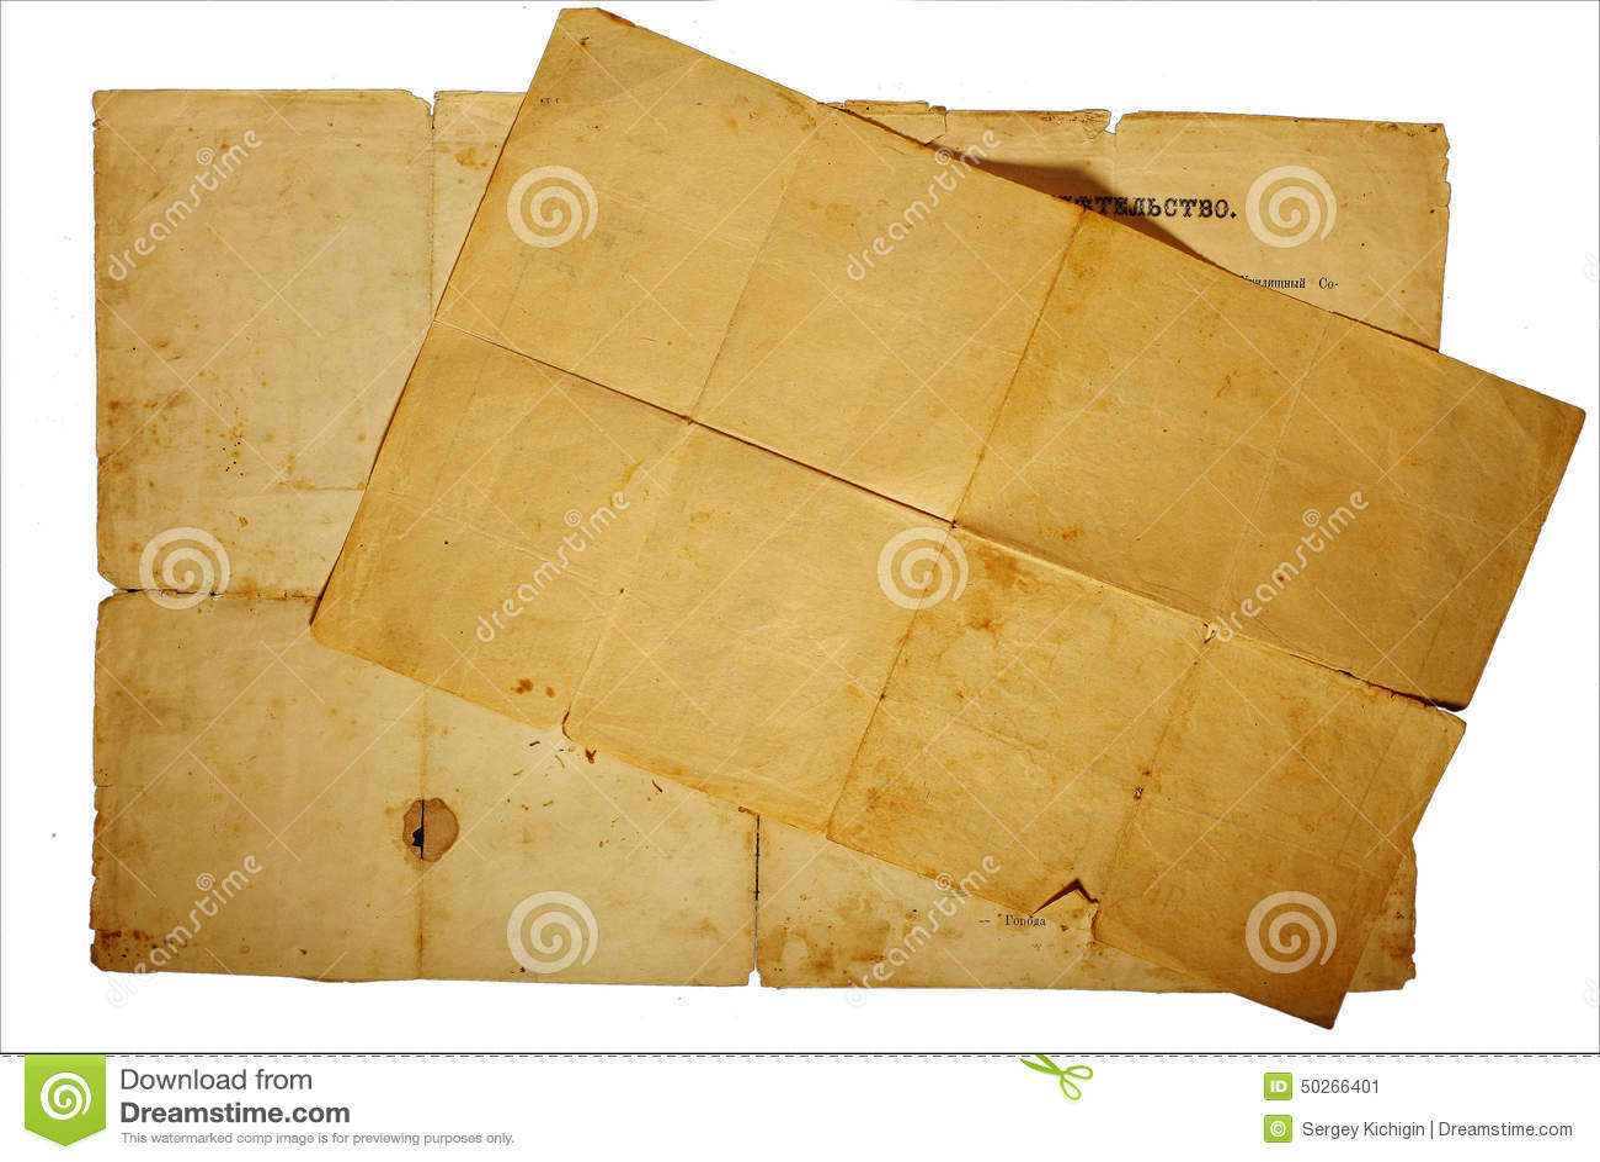 Tekstura stary rocznik yellowed papier, writing papiery